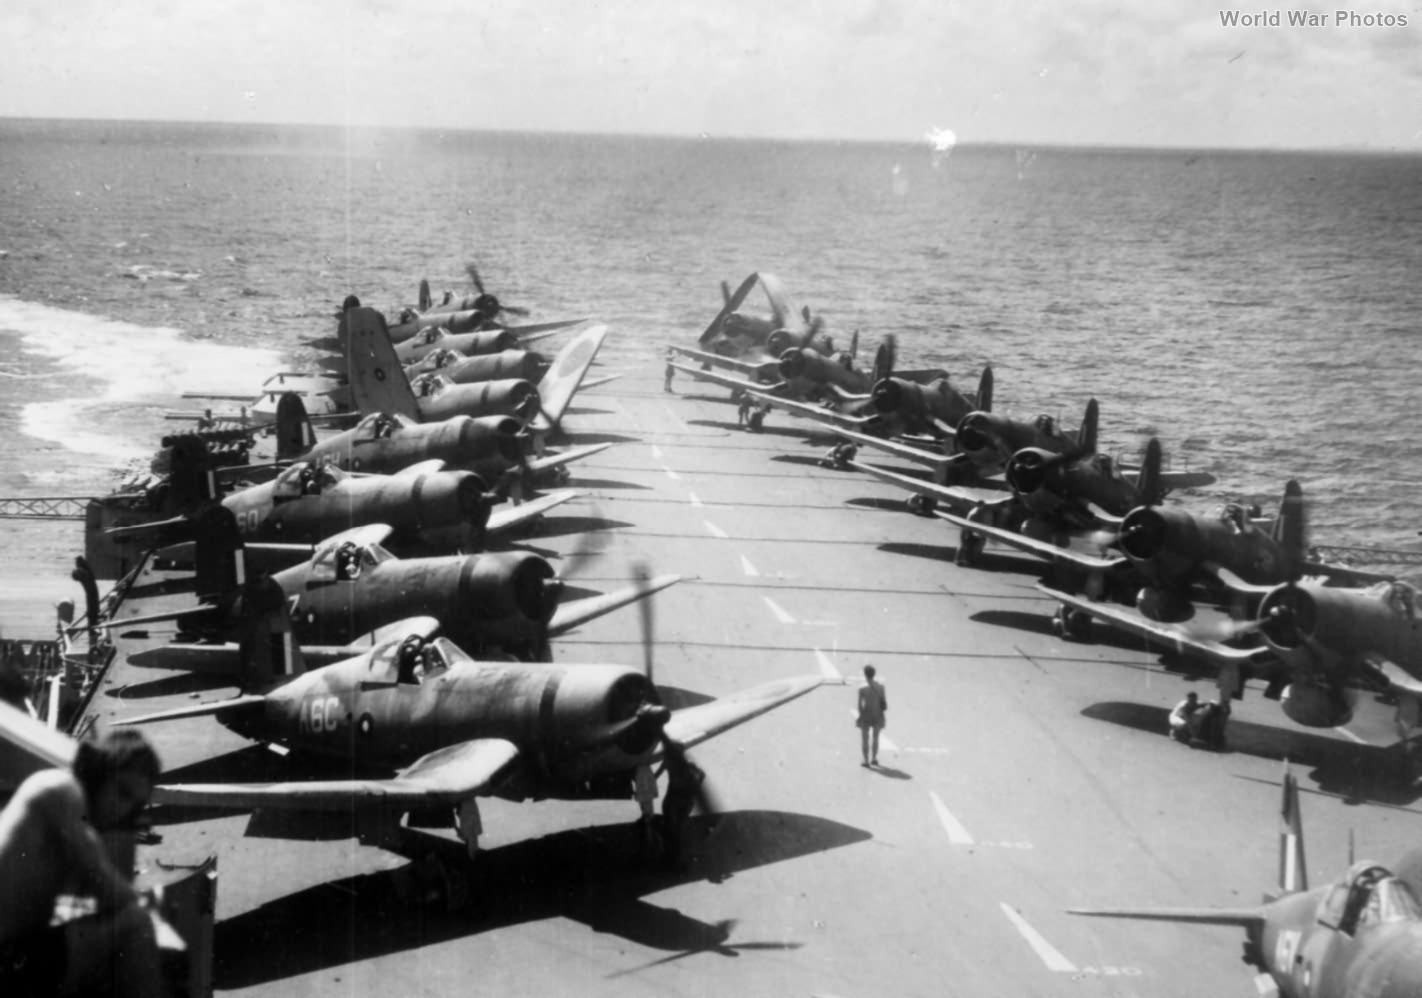 Corsairs aboard HMS Illustrious February 1945